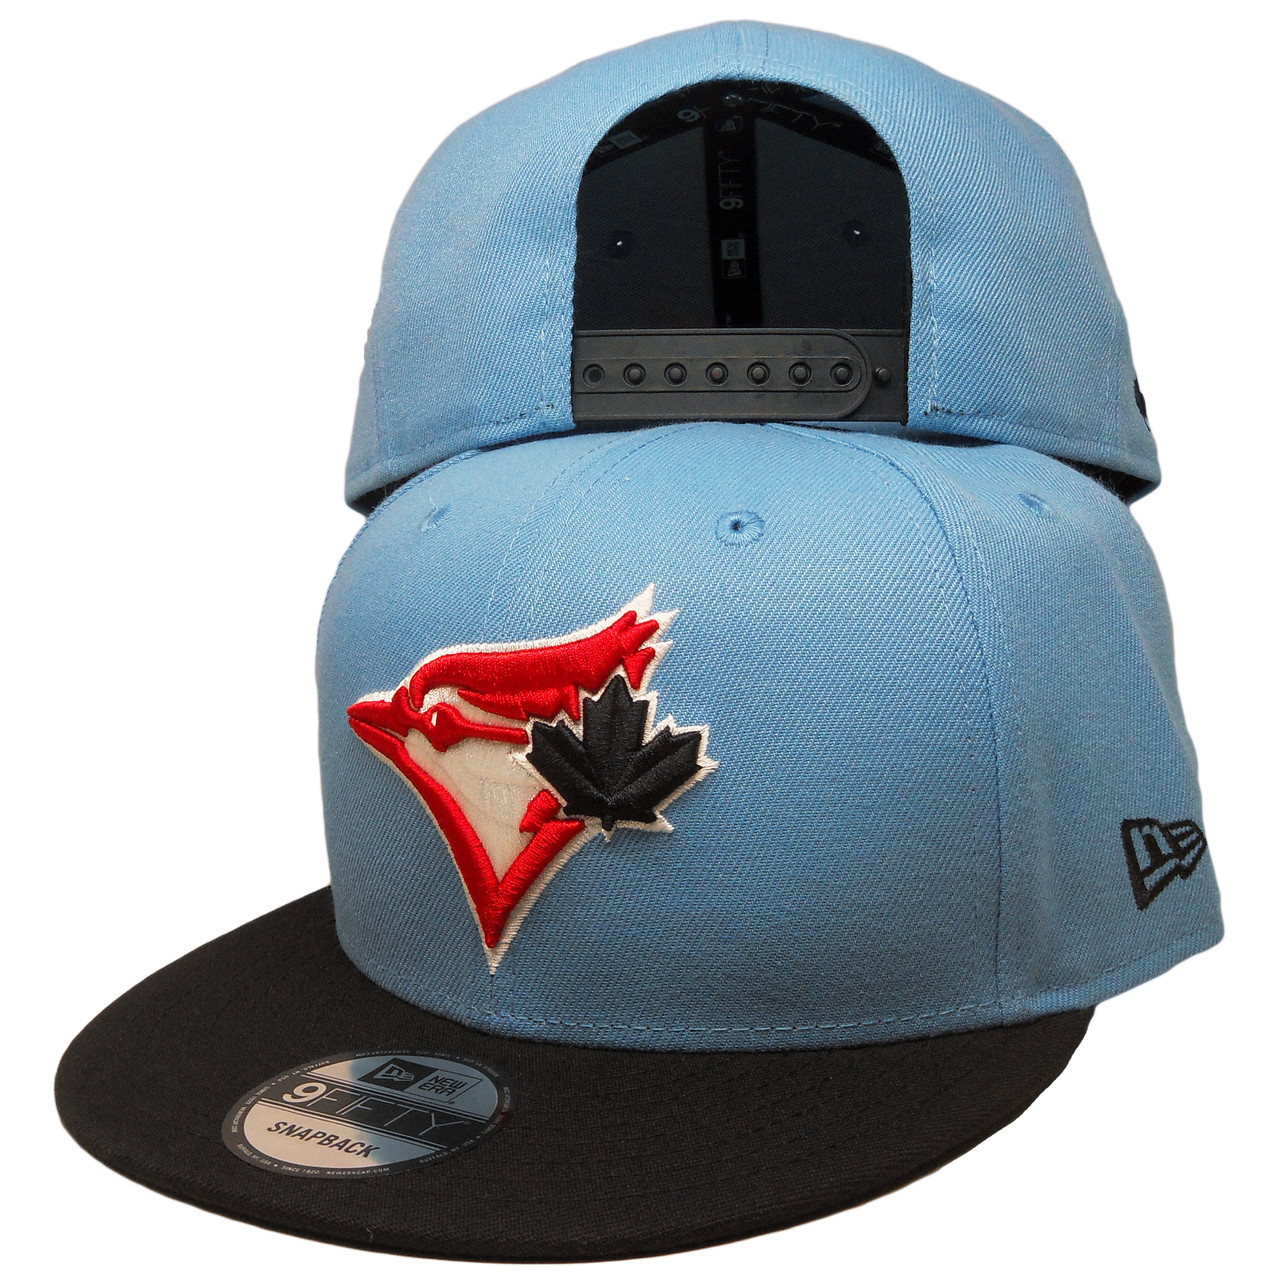 b68eb422 Toronto Blue Jays New Era Custom 9Fifty Snapback - Sky Blue, Black, Red -  ECapsUnlimited.com